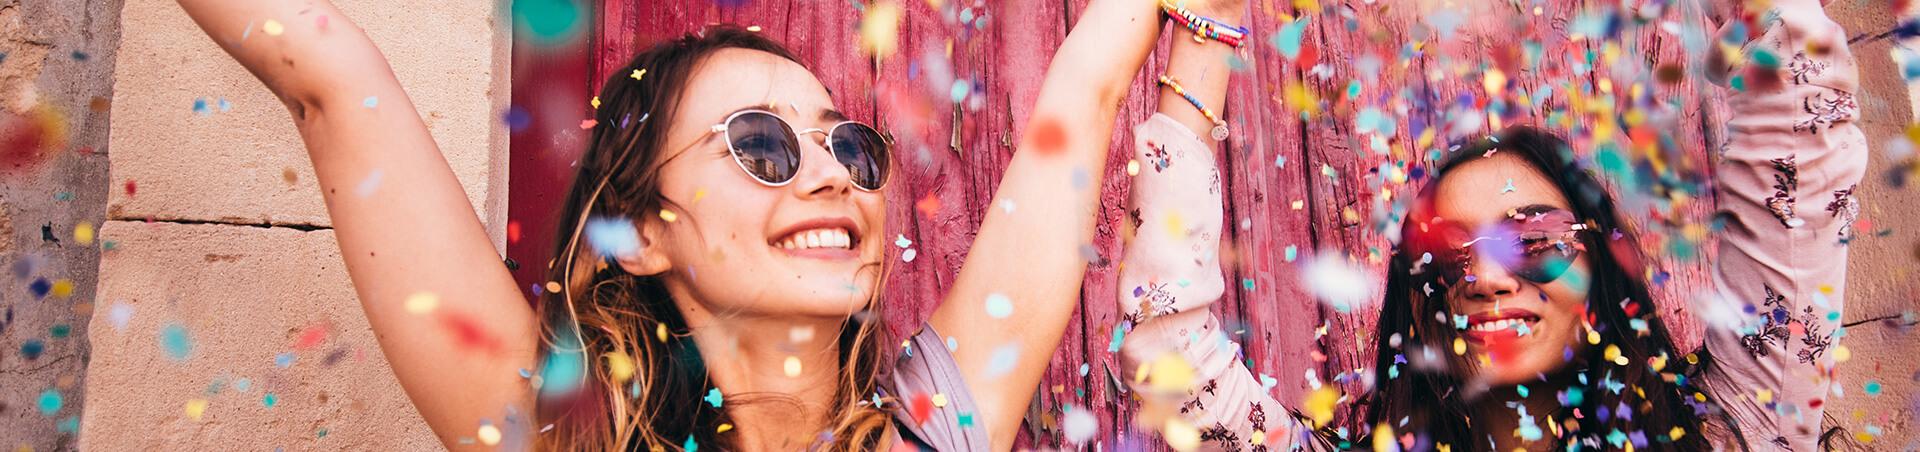 two women smiling while confetti falls around them